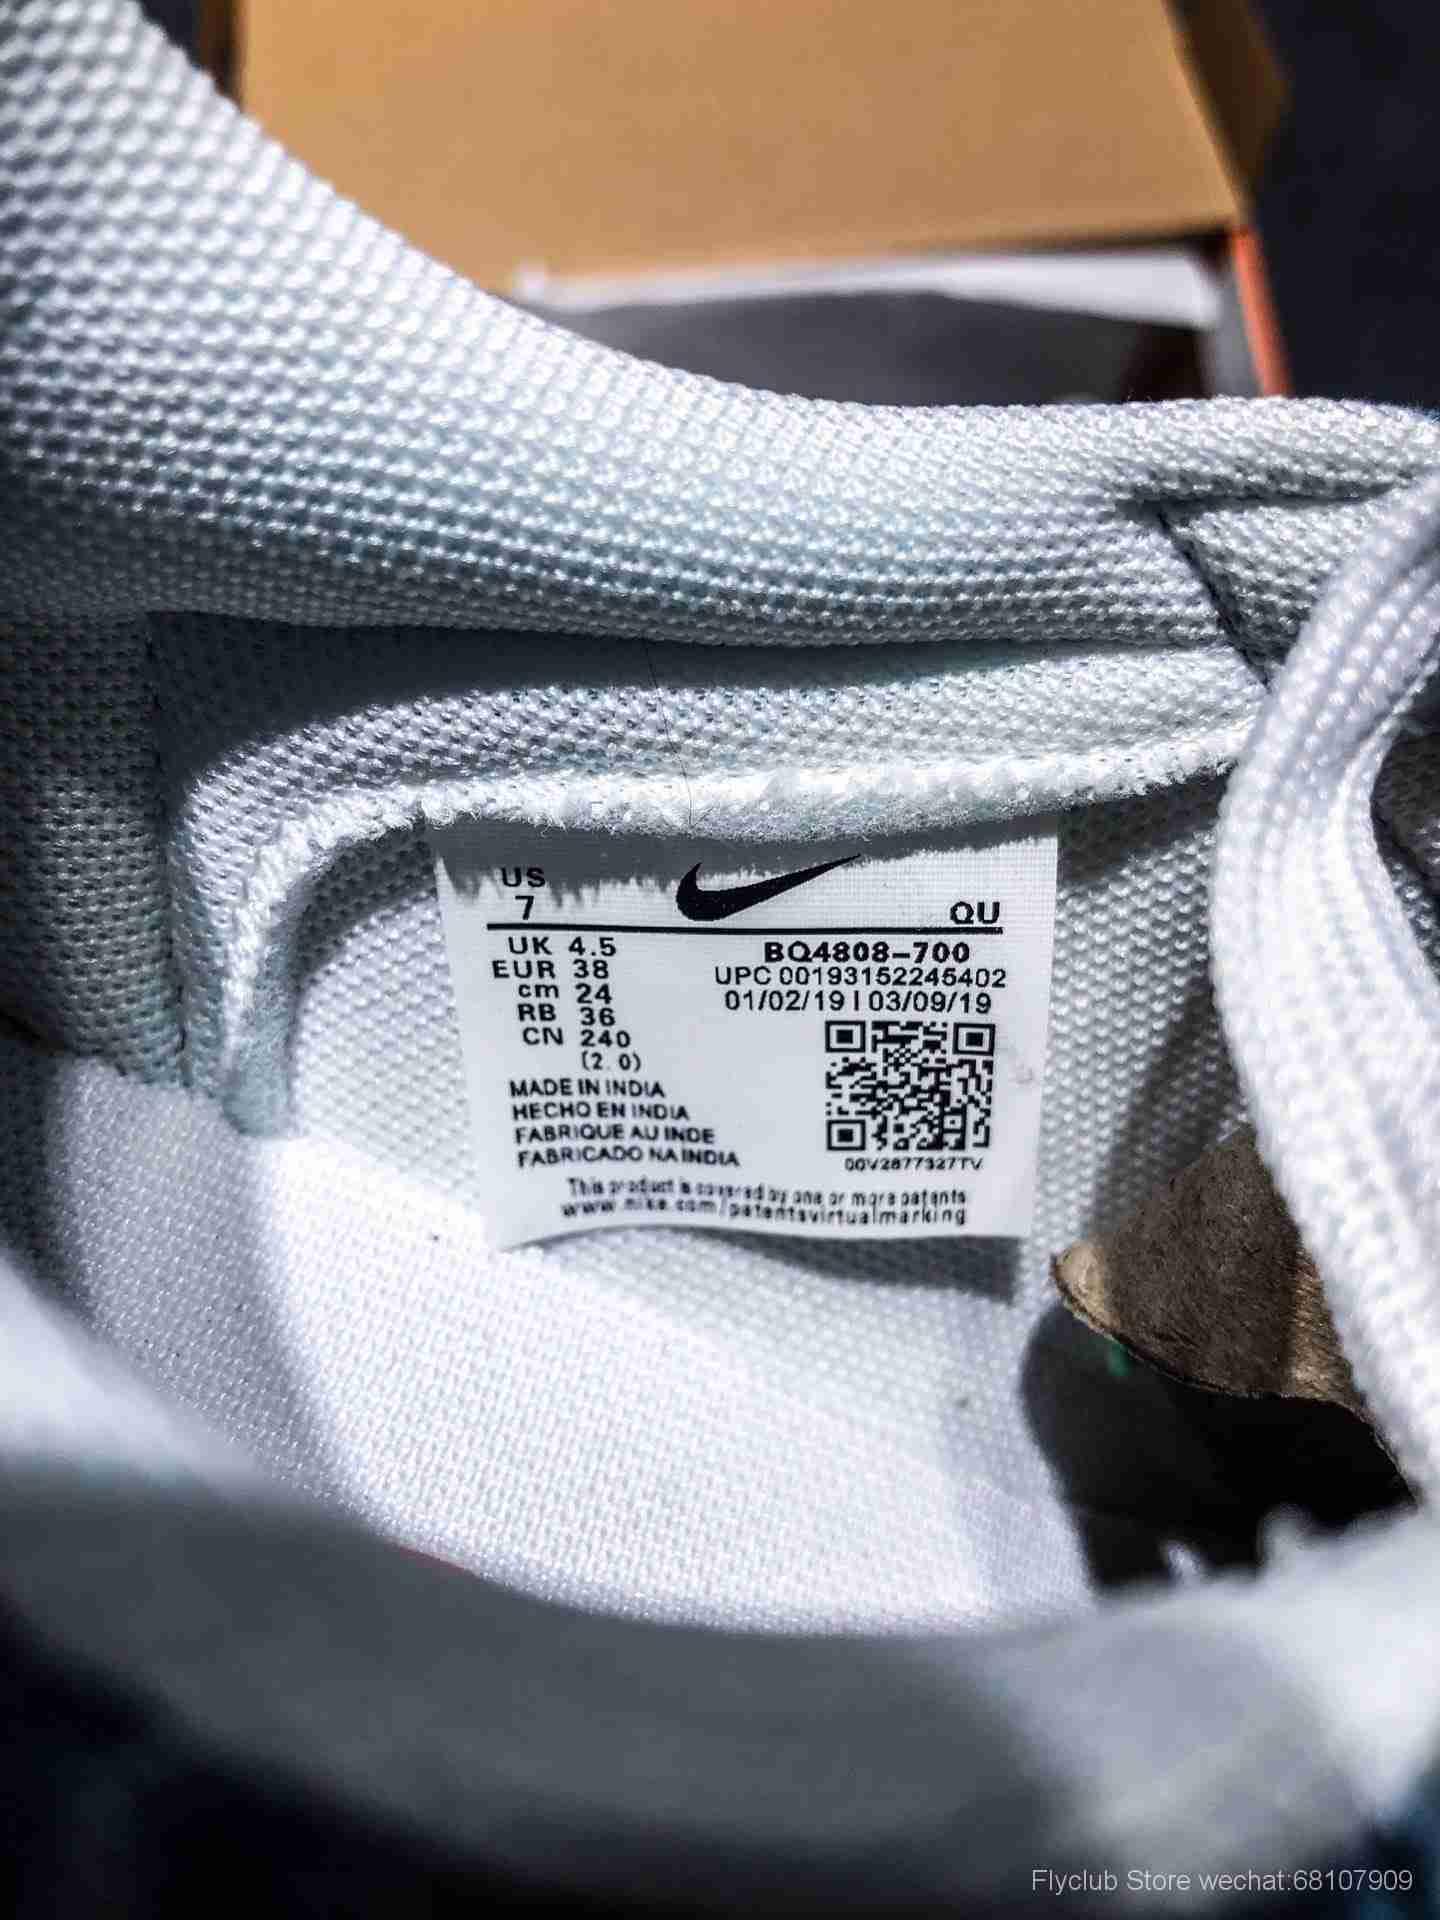 Blazer Low QS HH 开拓者牛仔布低帮休闲板鞋 BQ4808-700